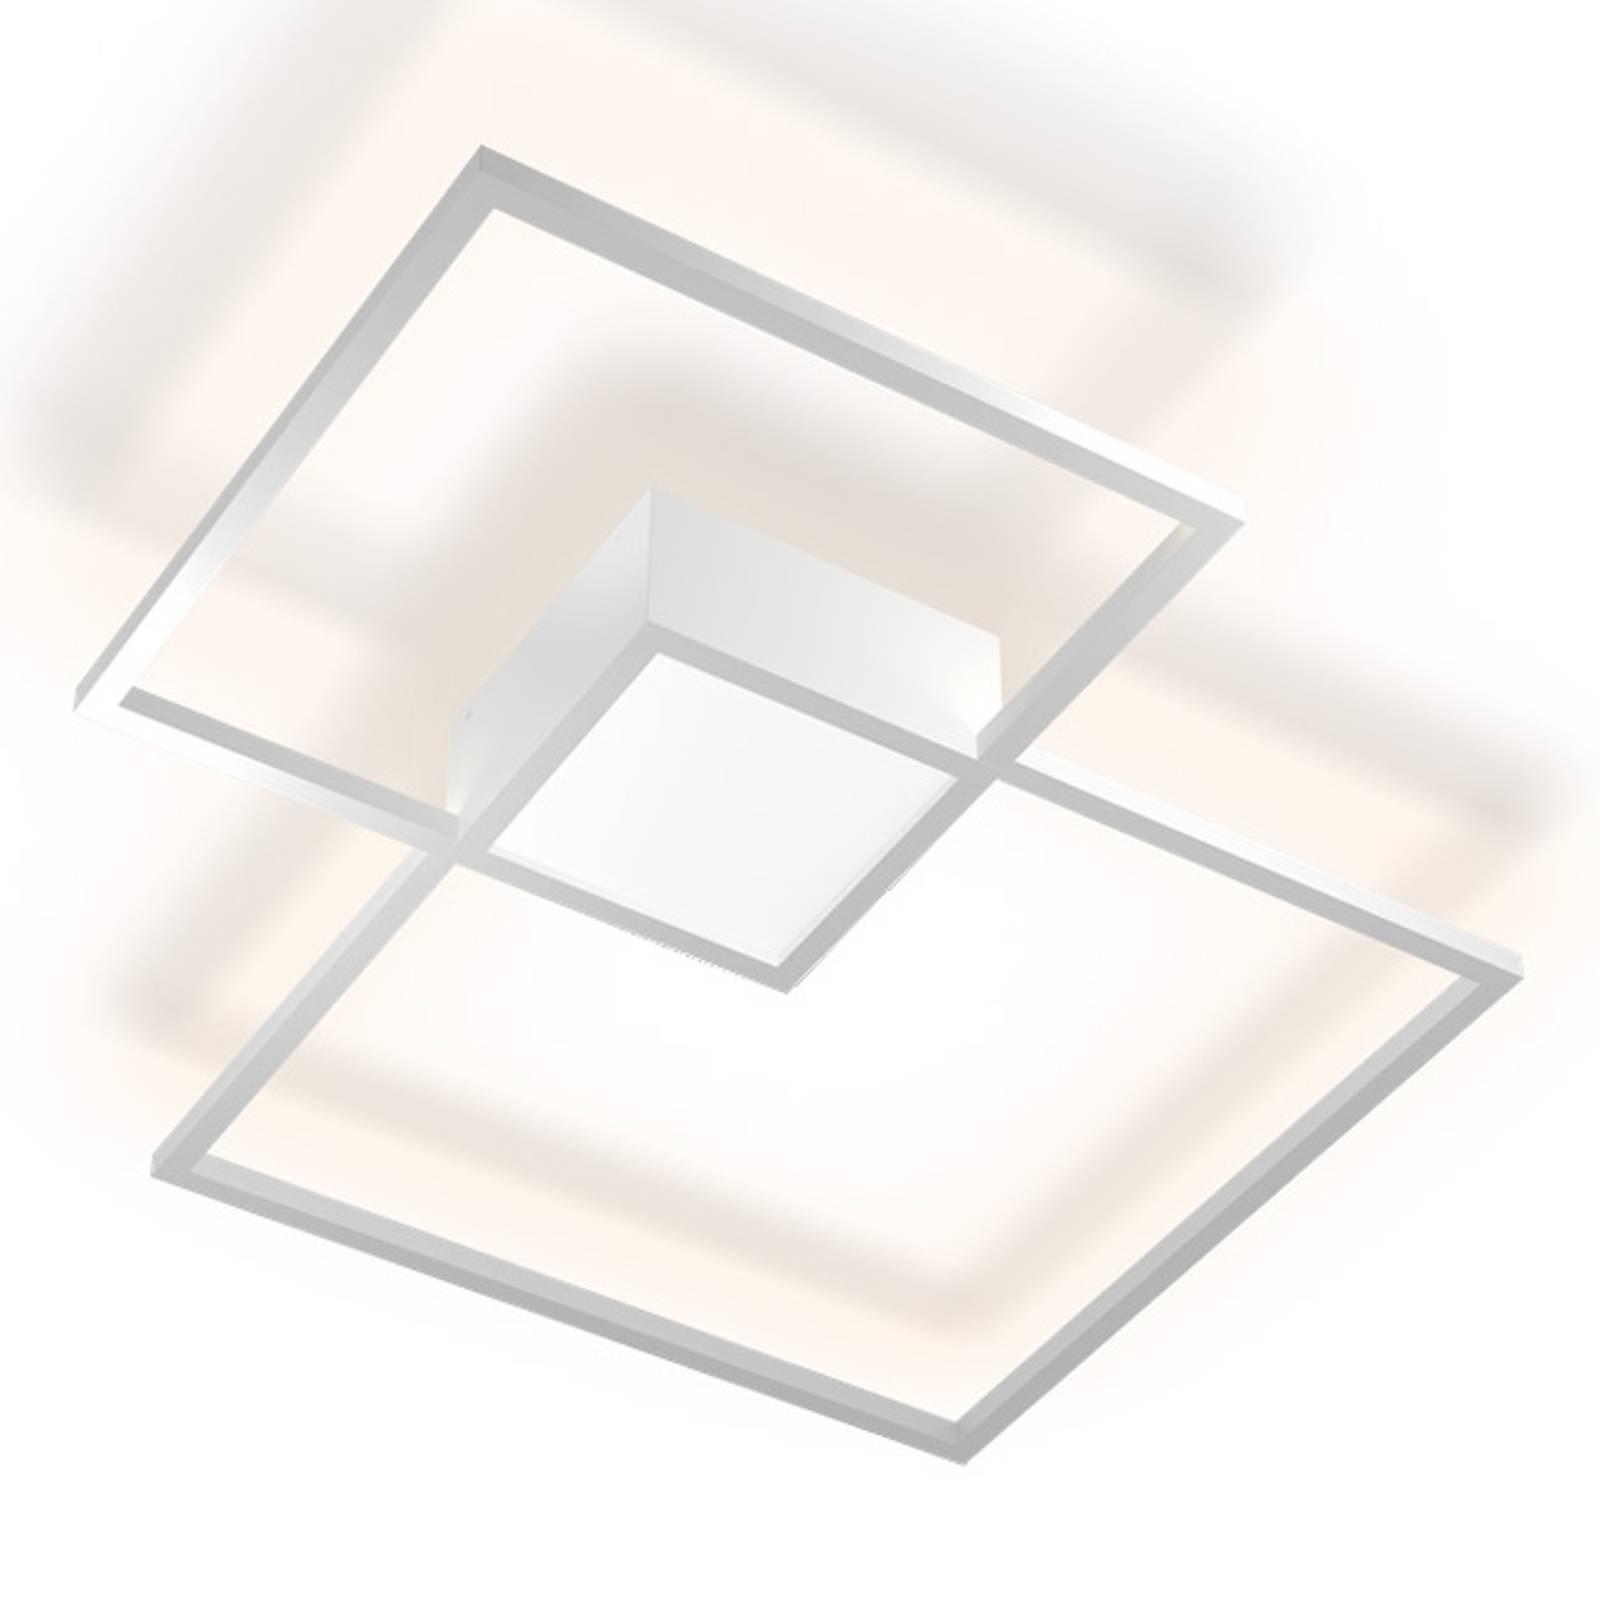 WEVER & DUCRÉ Venn 2.0 soffitto 47W 2.700K bianco